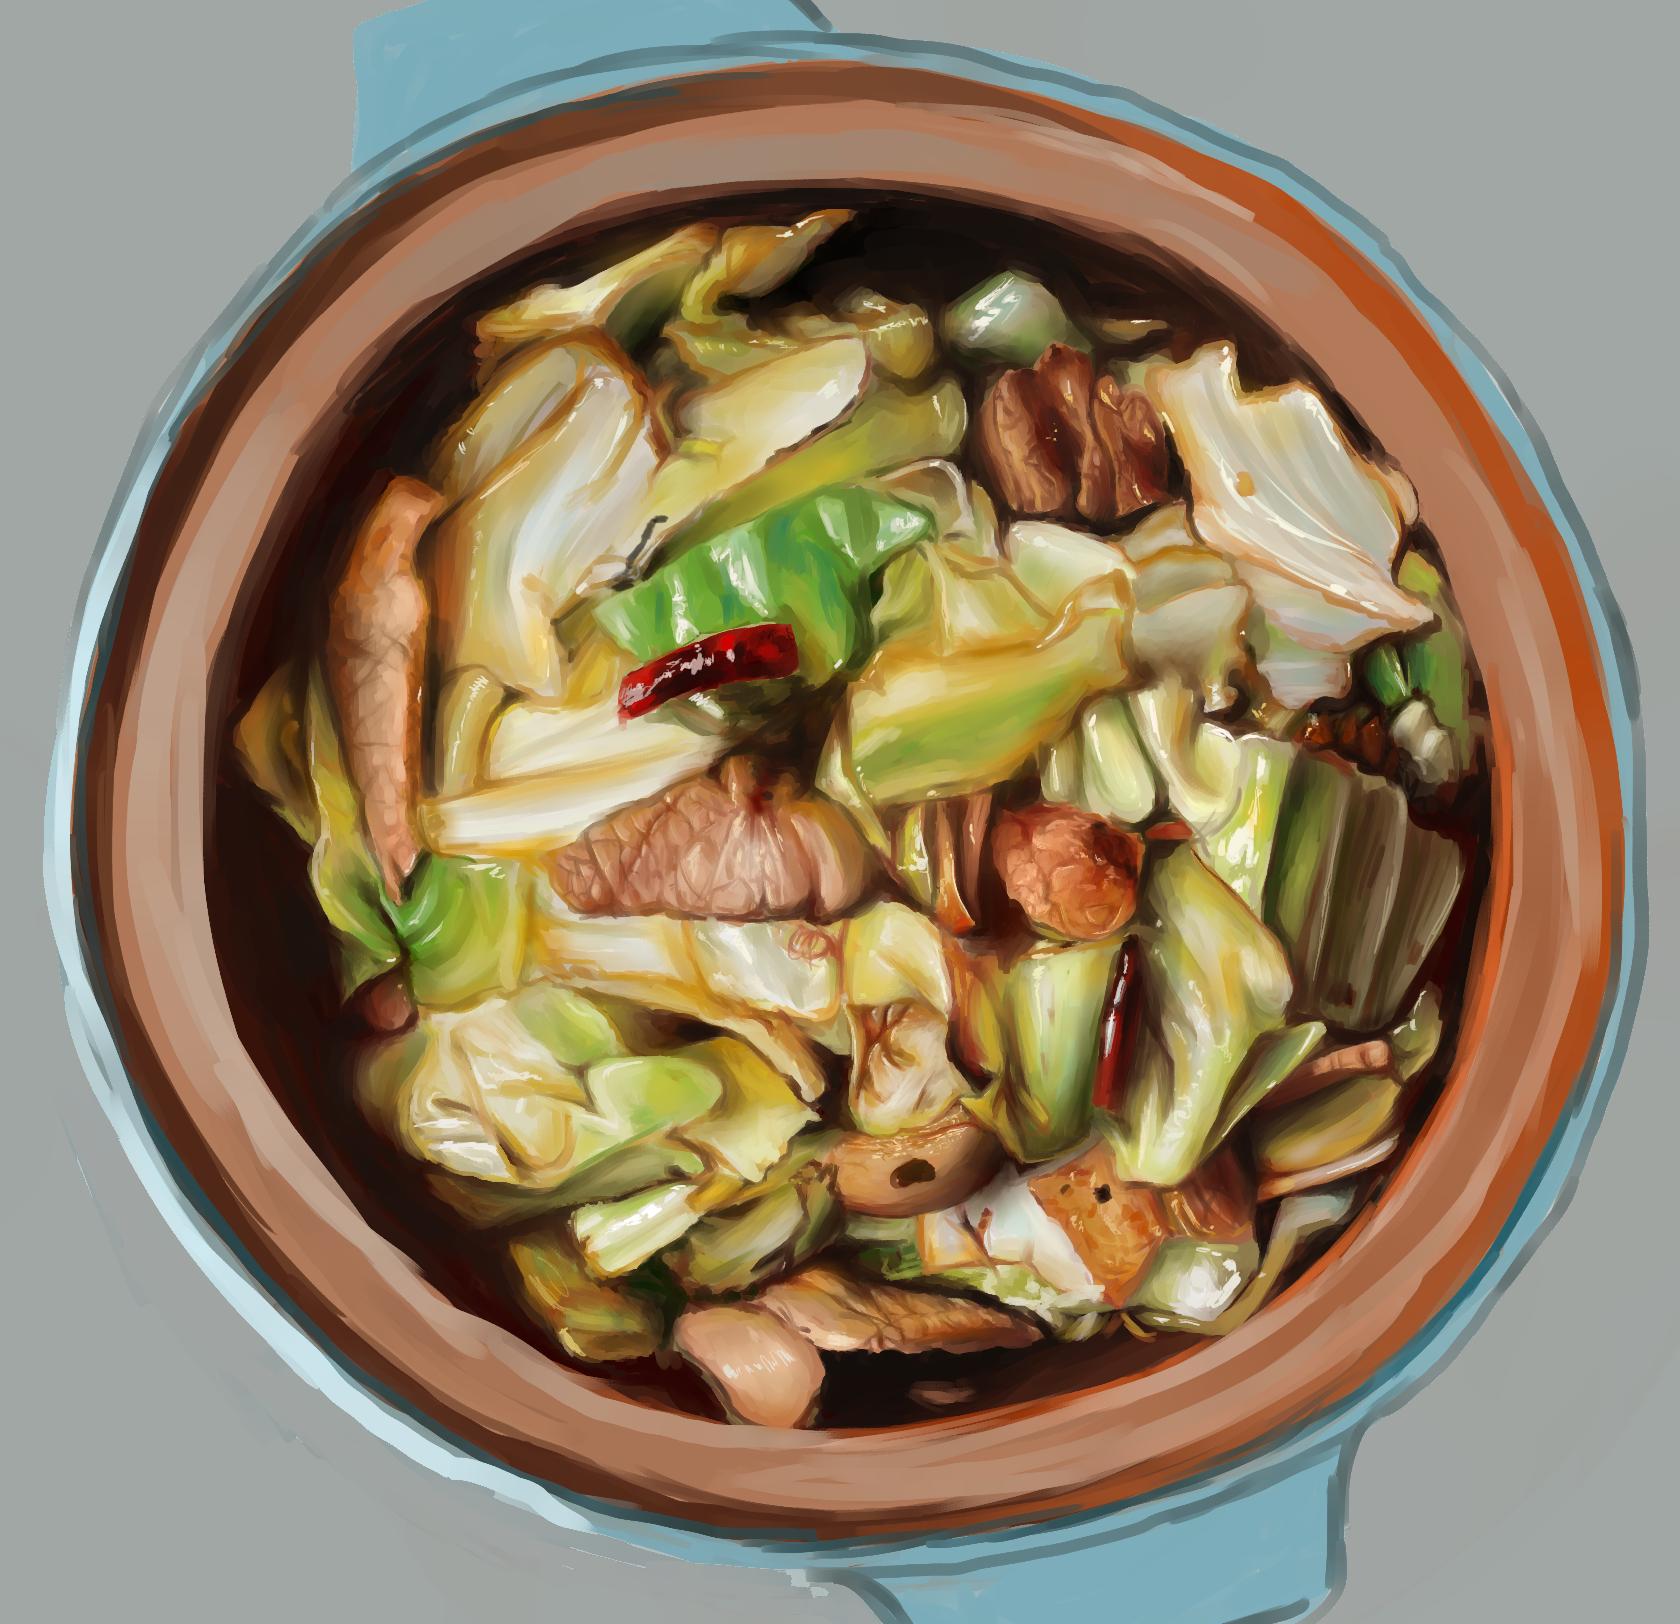 Stir-fried cabbage and pork